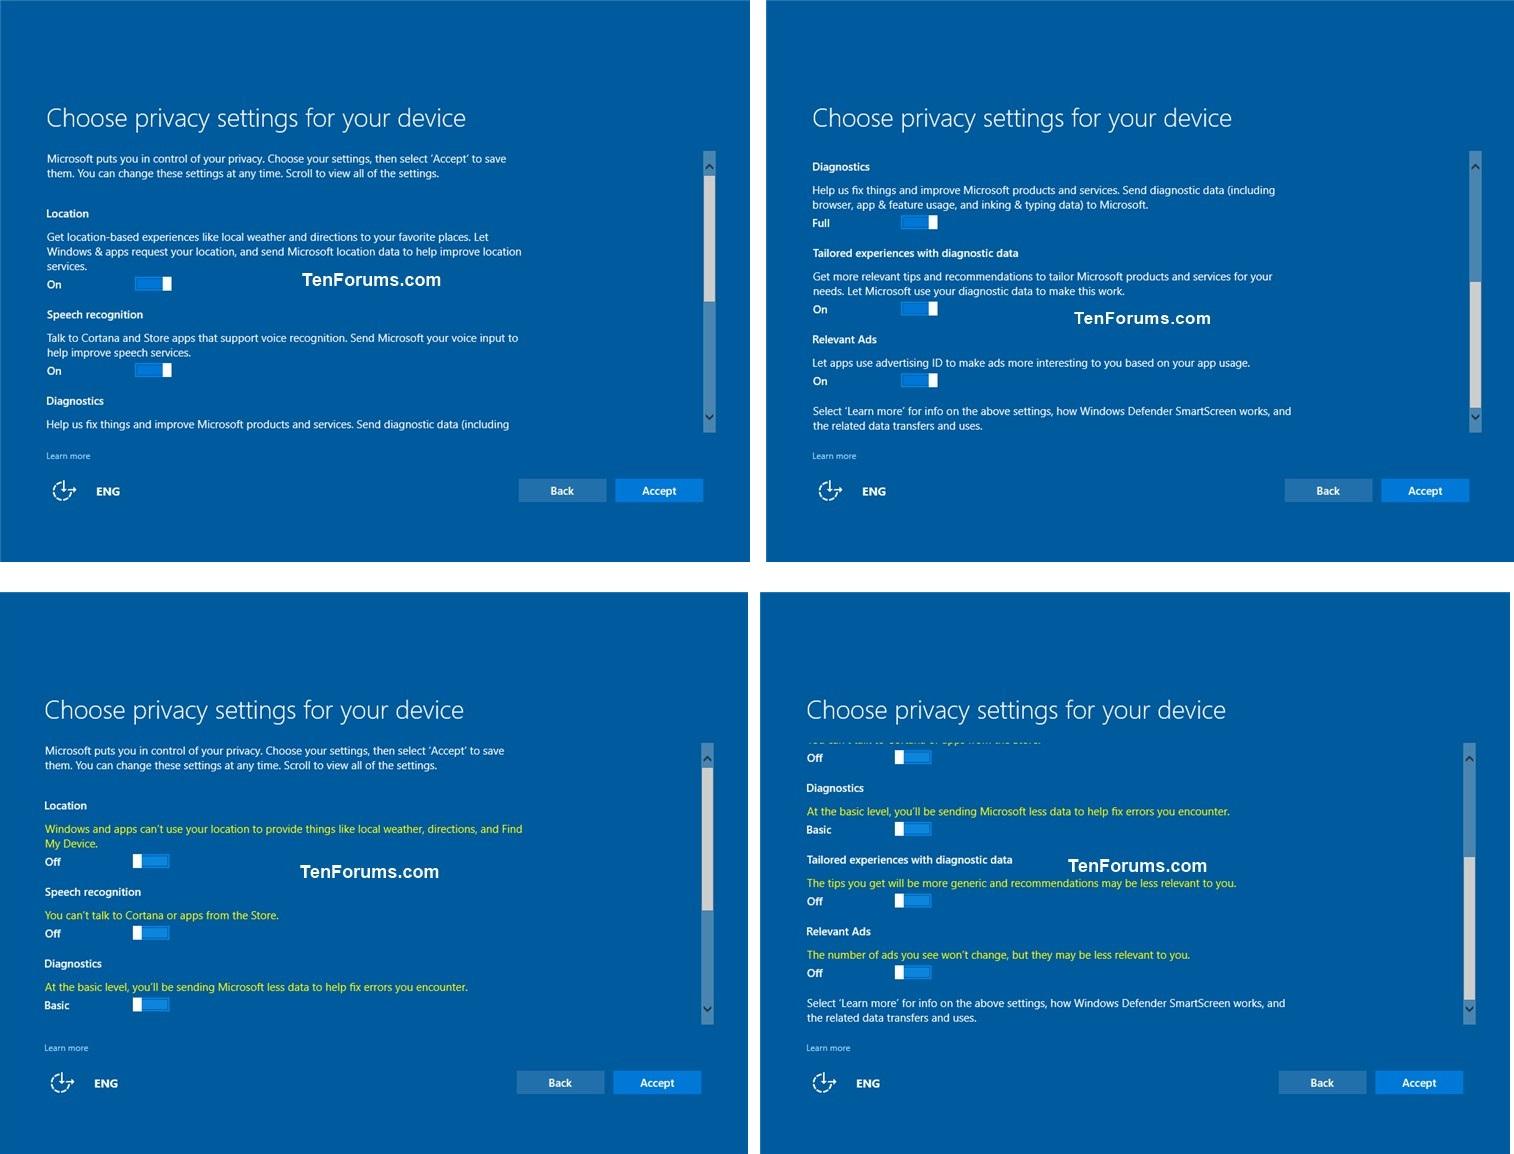 Install Windows 10 in S Mode on a Windows 10 PC | Tutorials